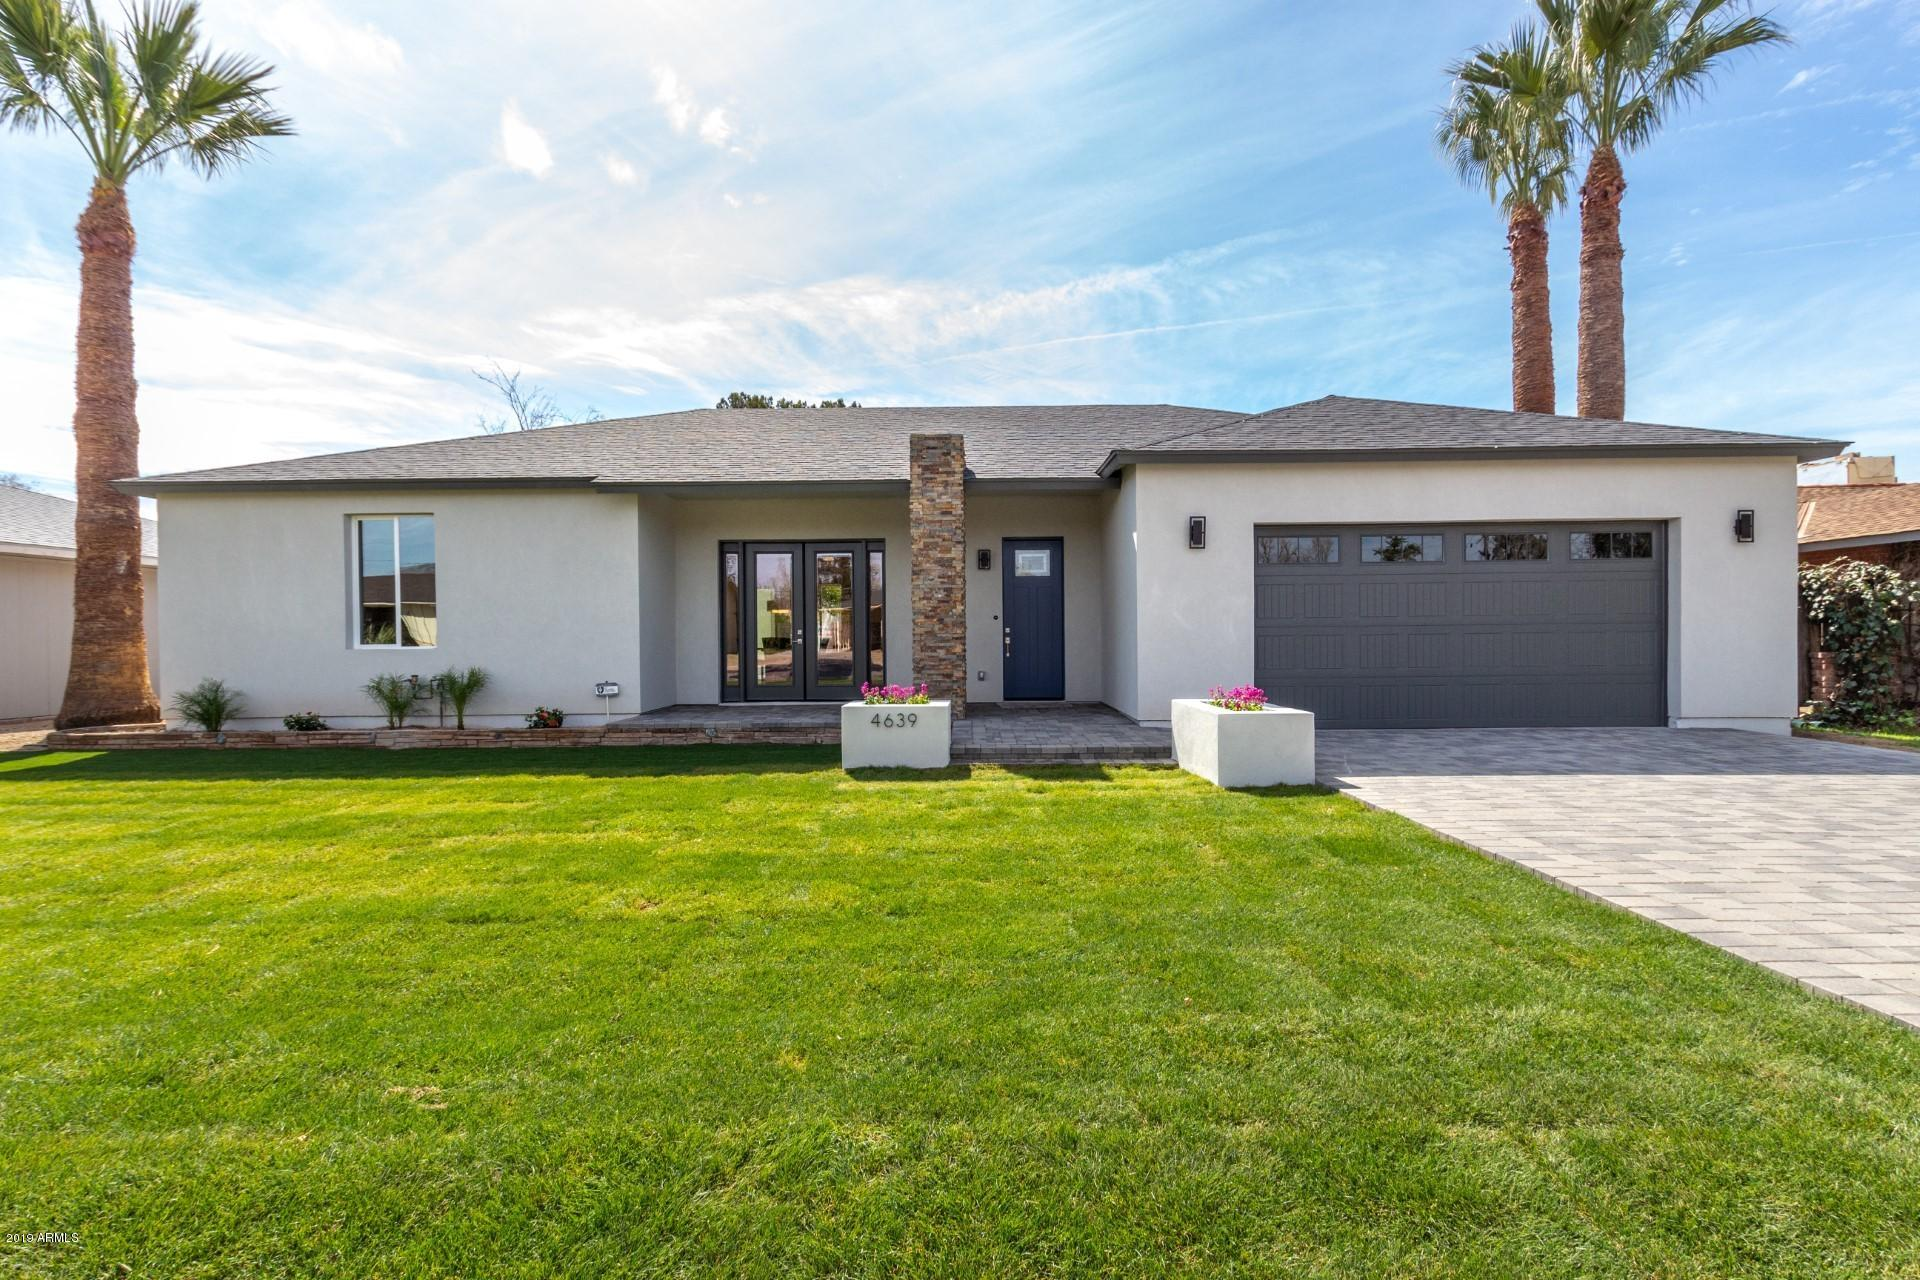 Photo of 4639 E VIRGINIA Avenue, Phoenix, AZ 85008